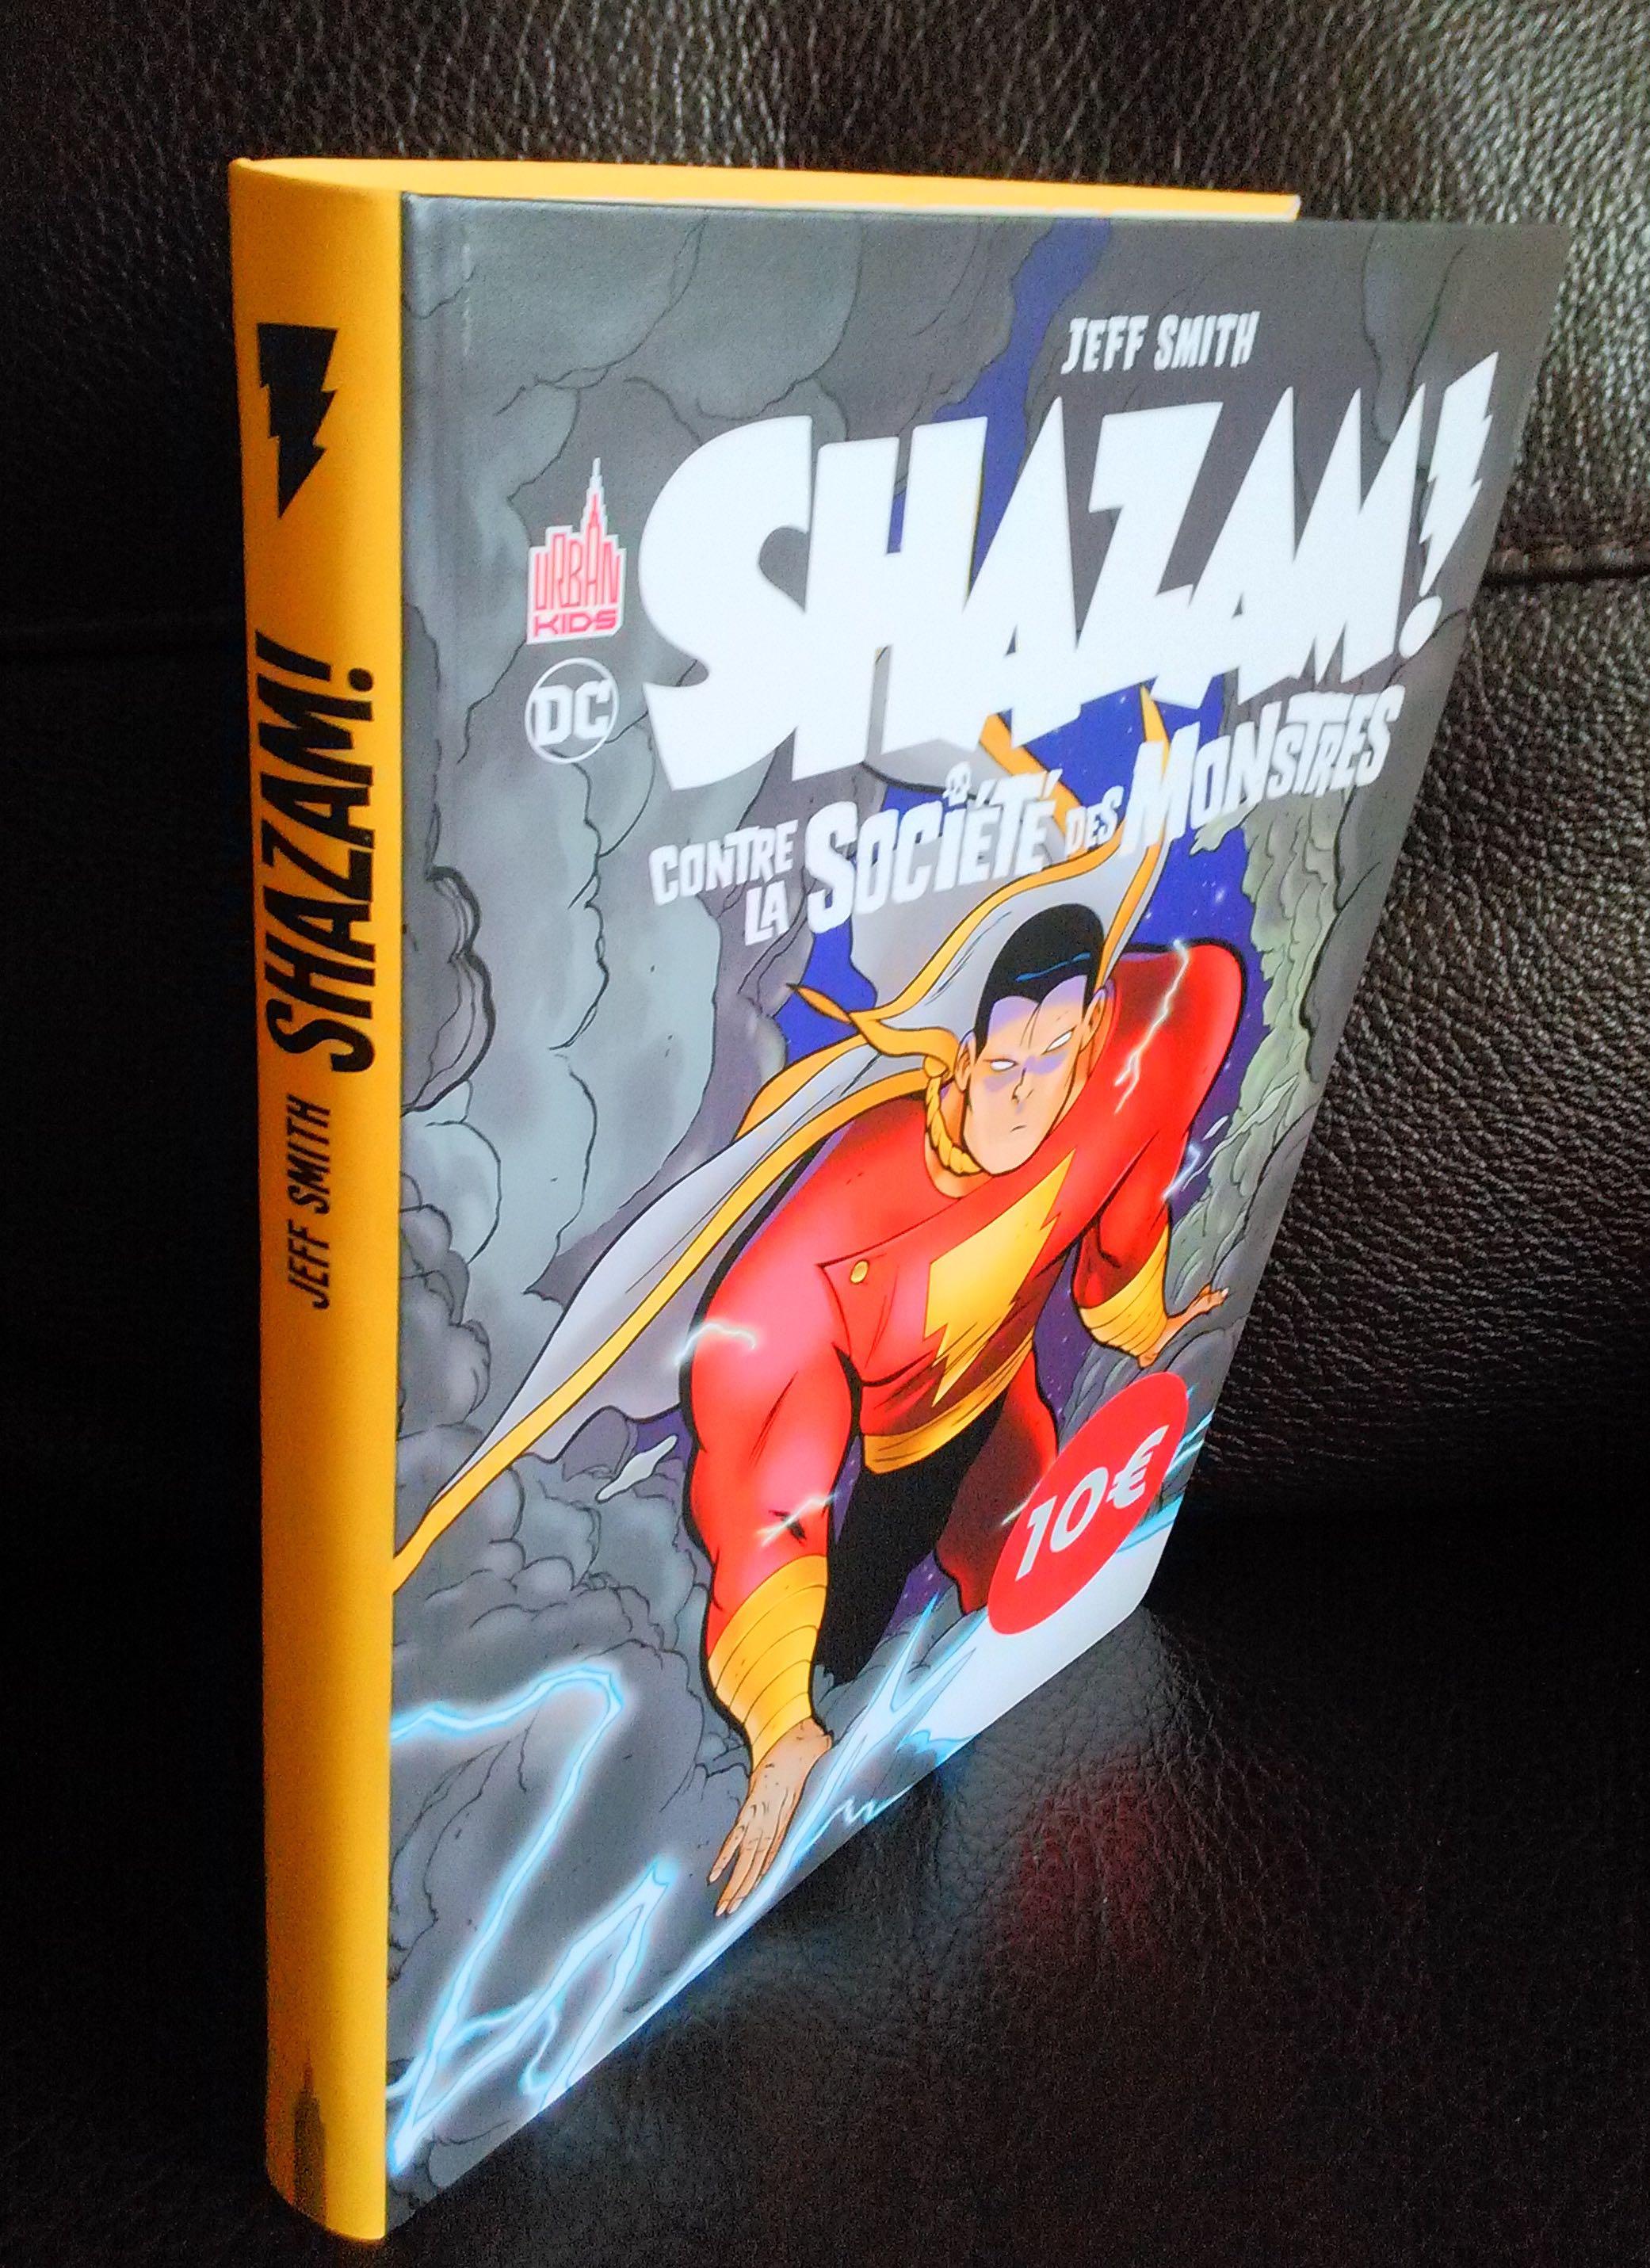 Shazam contre societe monstres